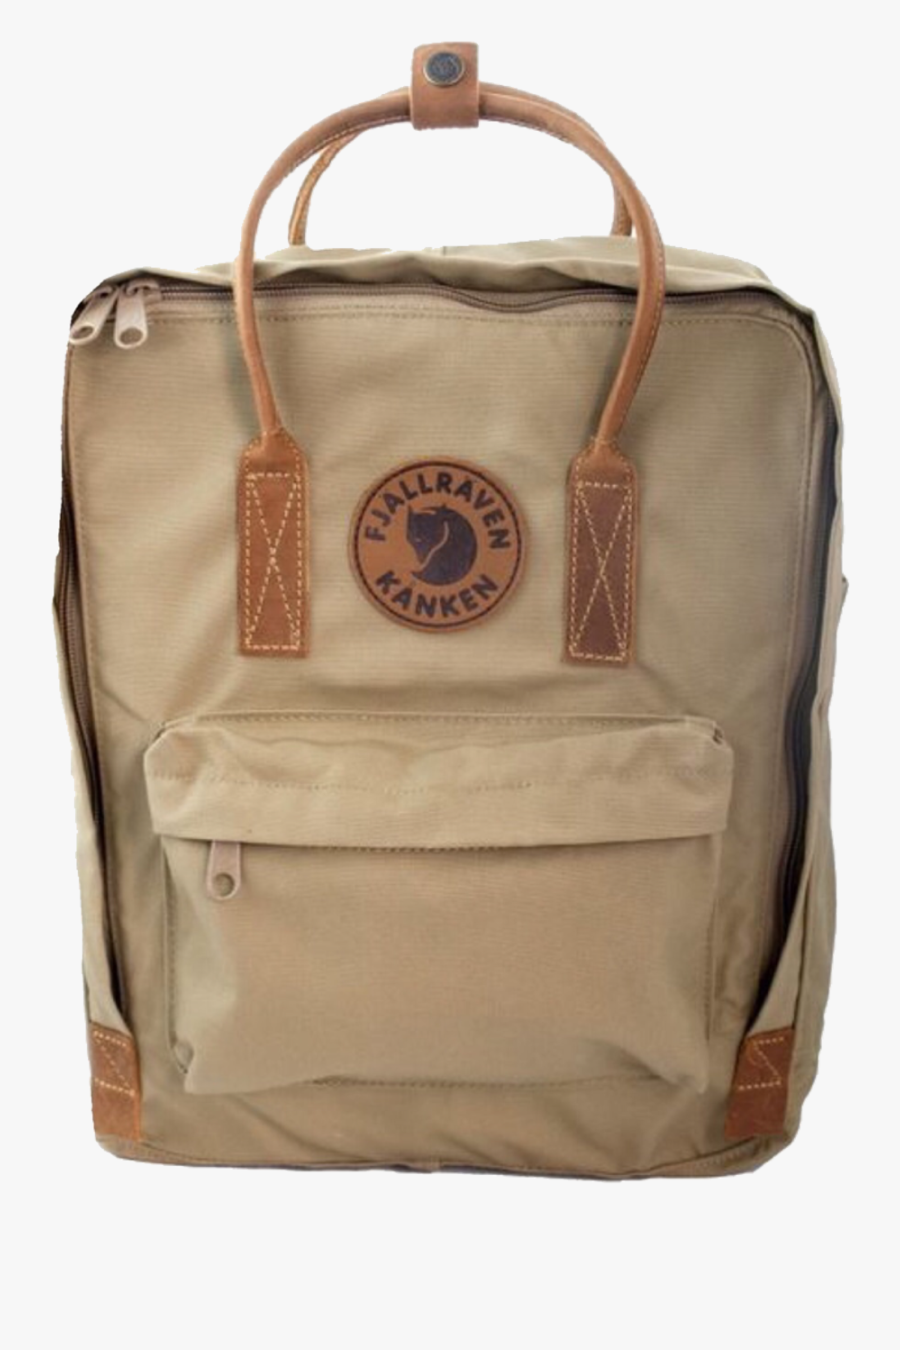 #brown #backpack #cute #aesthetic #overlay #edit #trendy - Fjällräven Kånken No.2, Transparent Clipart